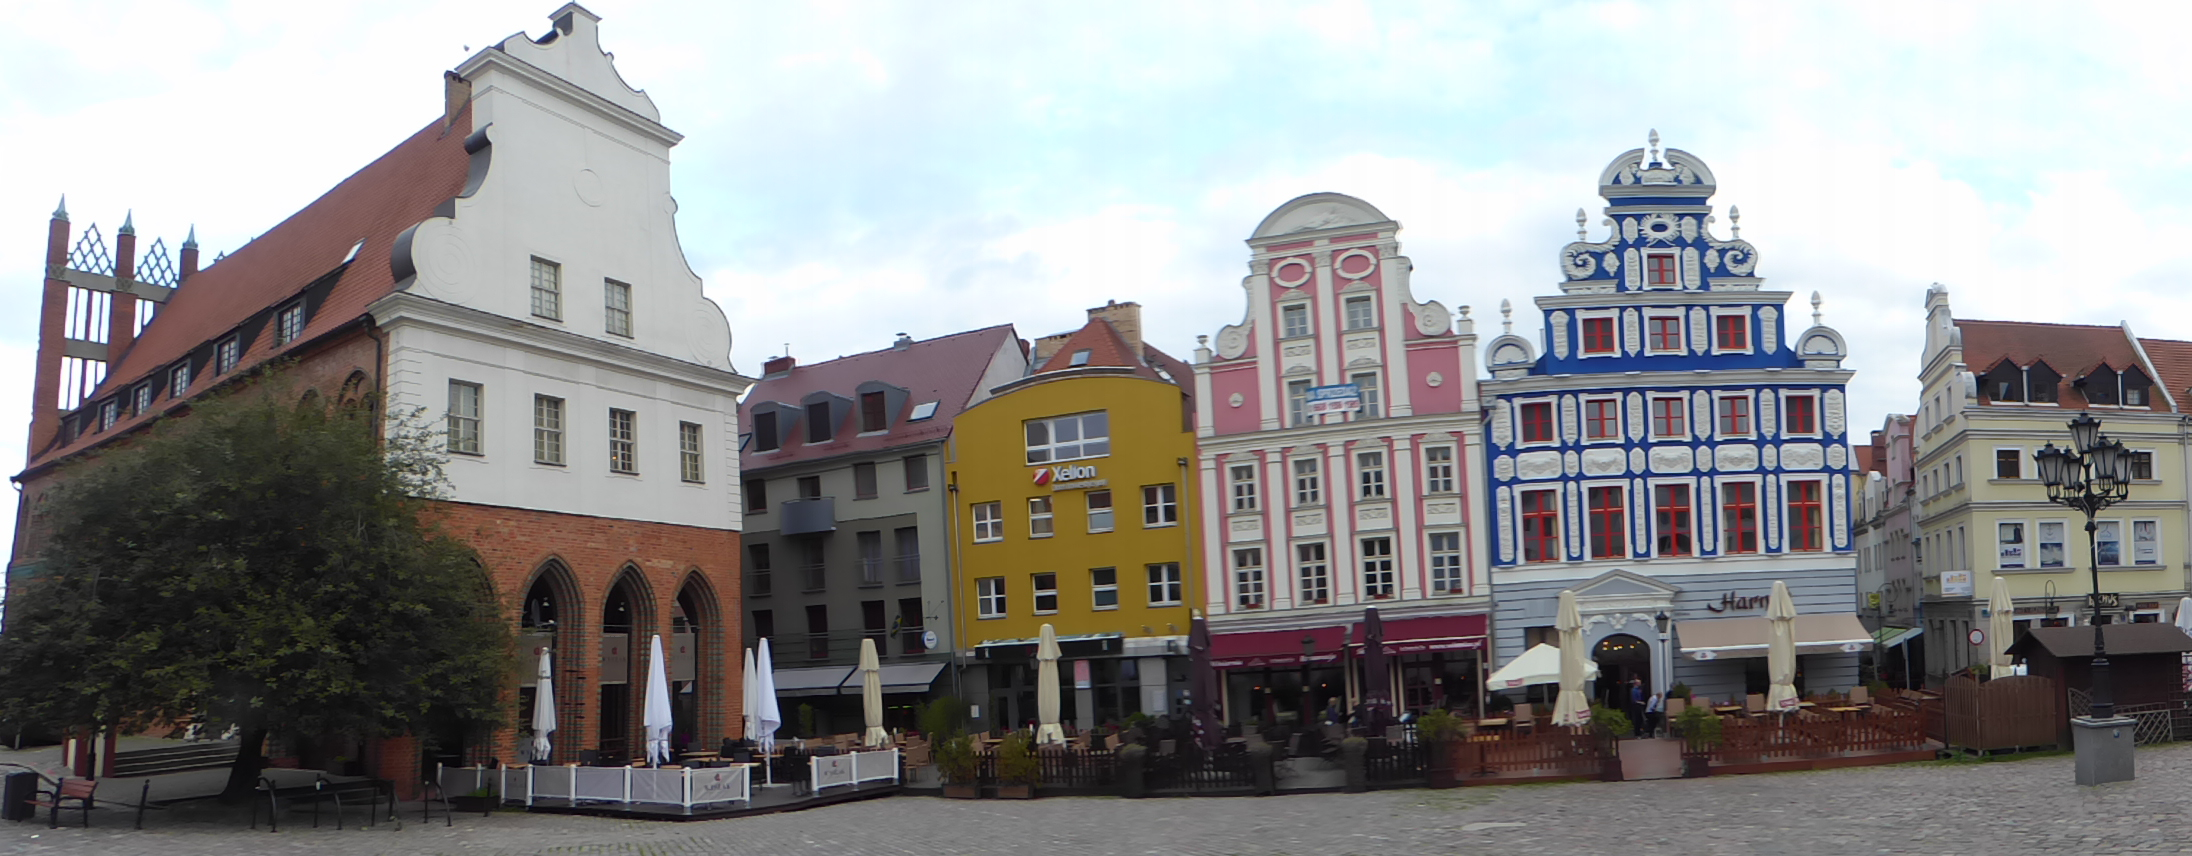 Stettin Szczecin Panorama